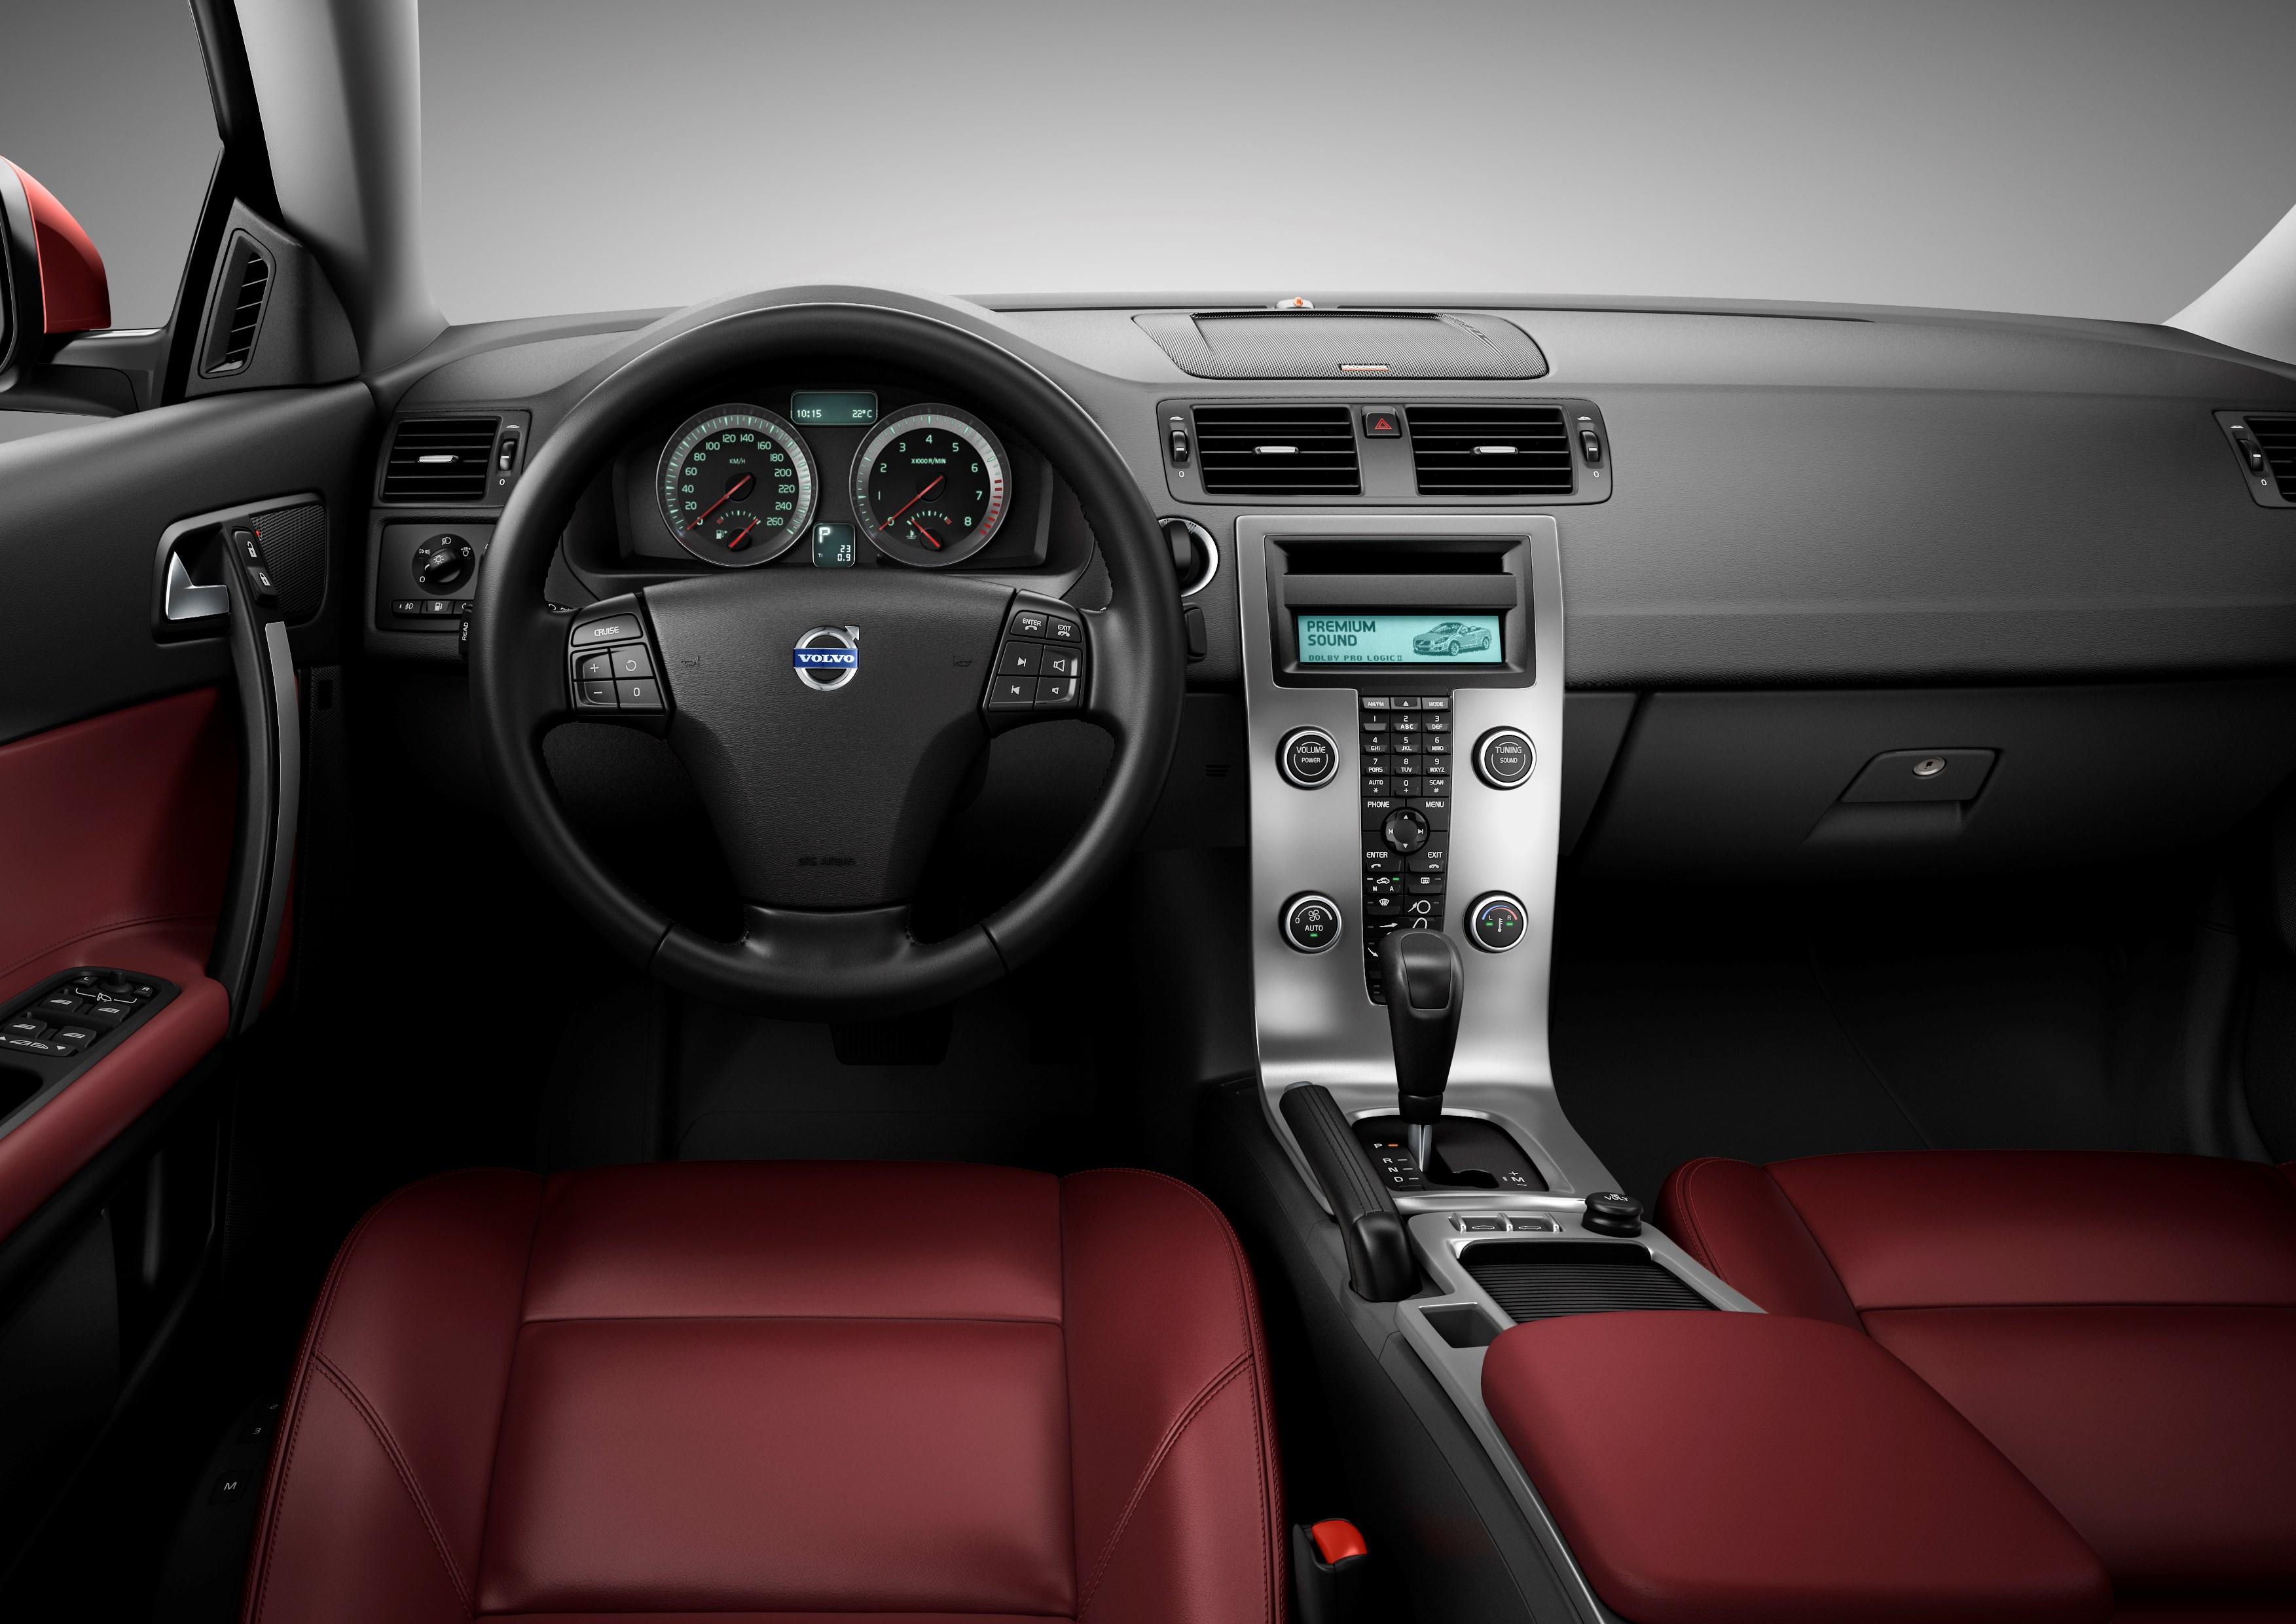 Volvo C70 Interieur